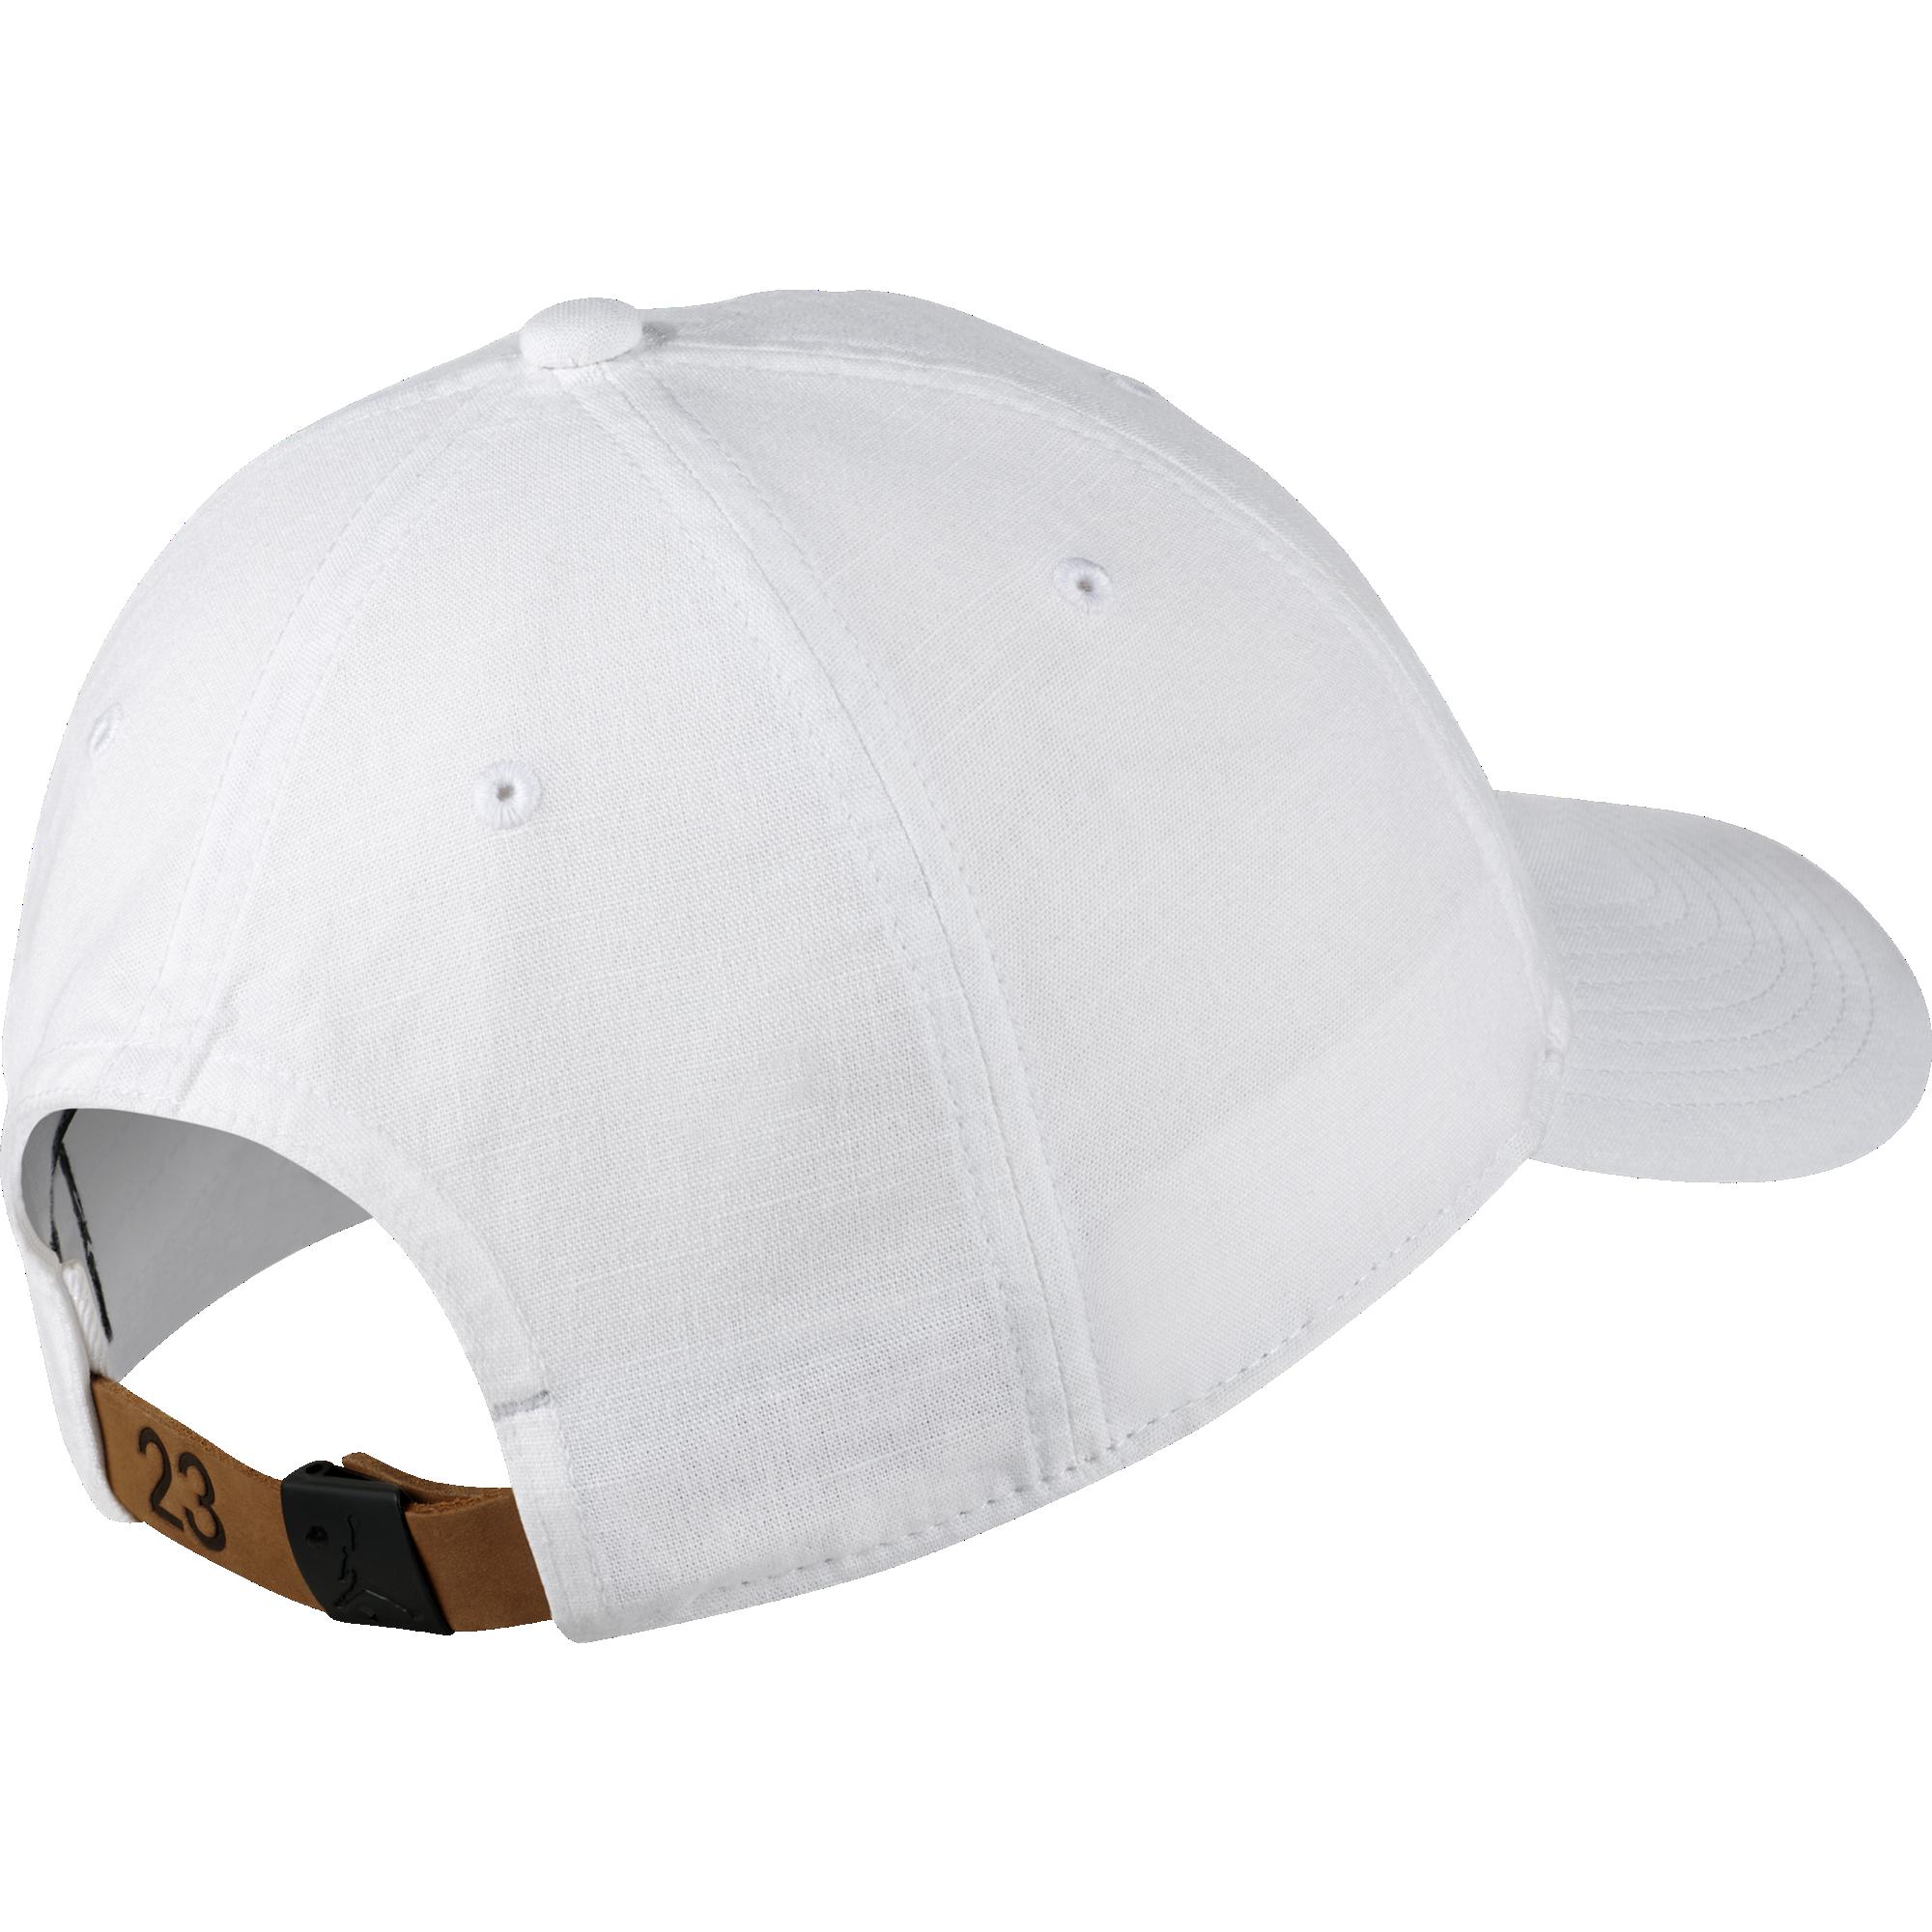 wholesale dealer 25cc2 3ac59 AIR JORDAN HERITAGE H86 JUMPMAN WASHED HAT. Previous Next